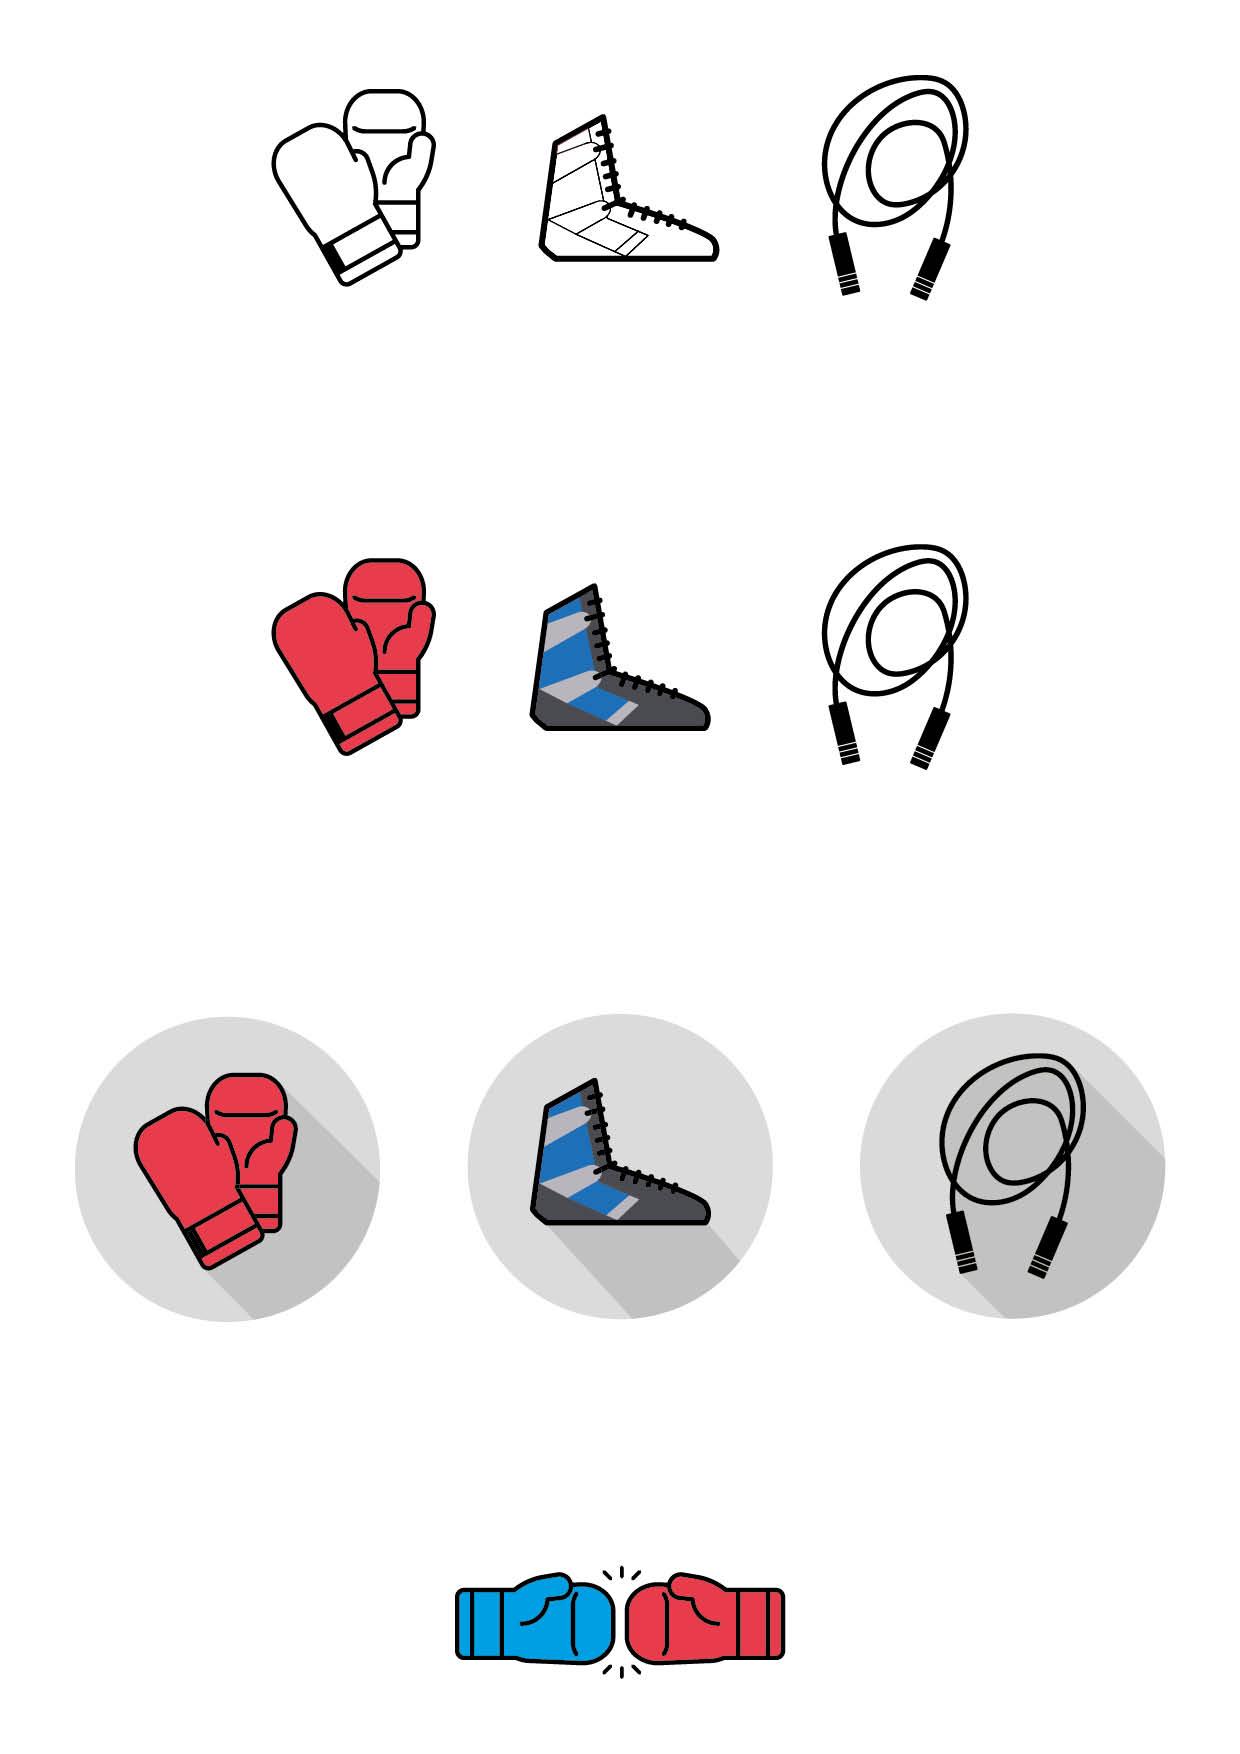 savate-icons-2